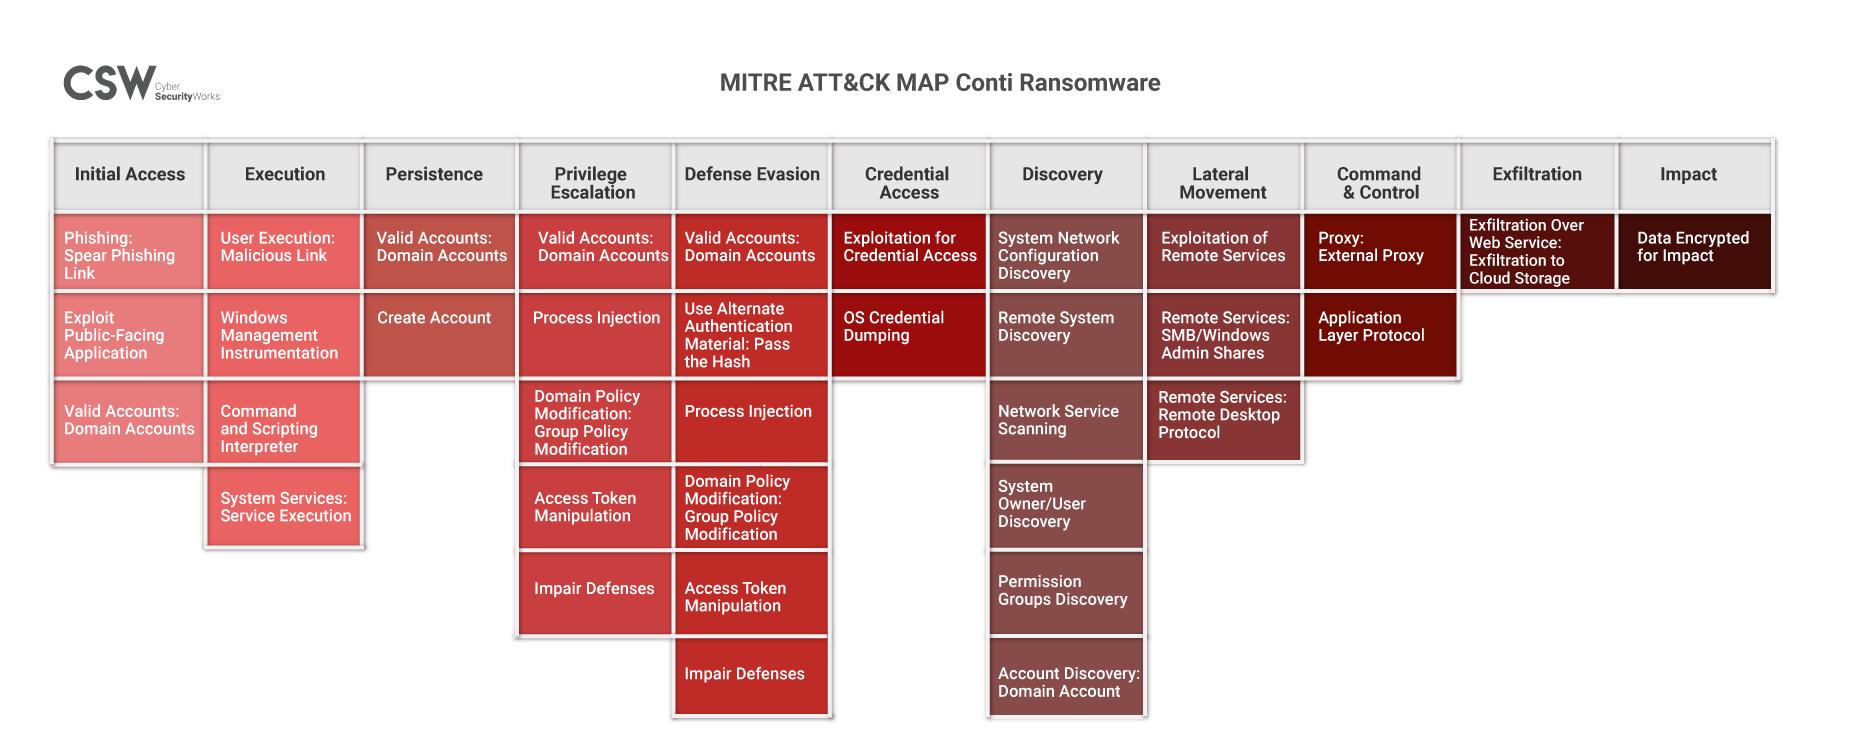 MITRE Att&ck Map Conti Ransomware